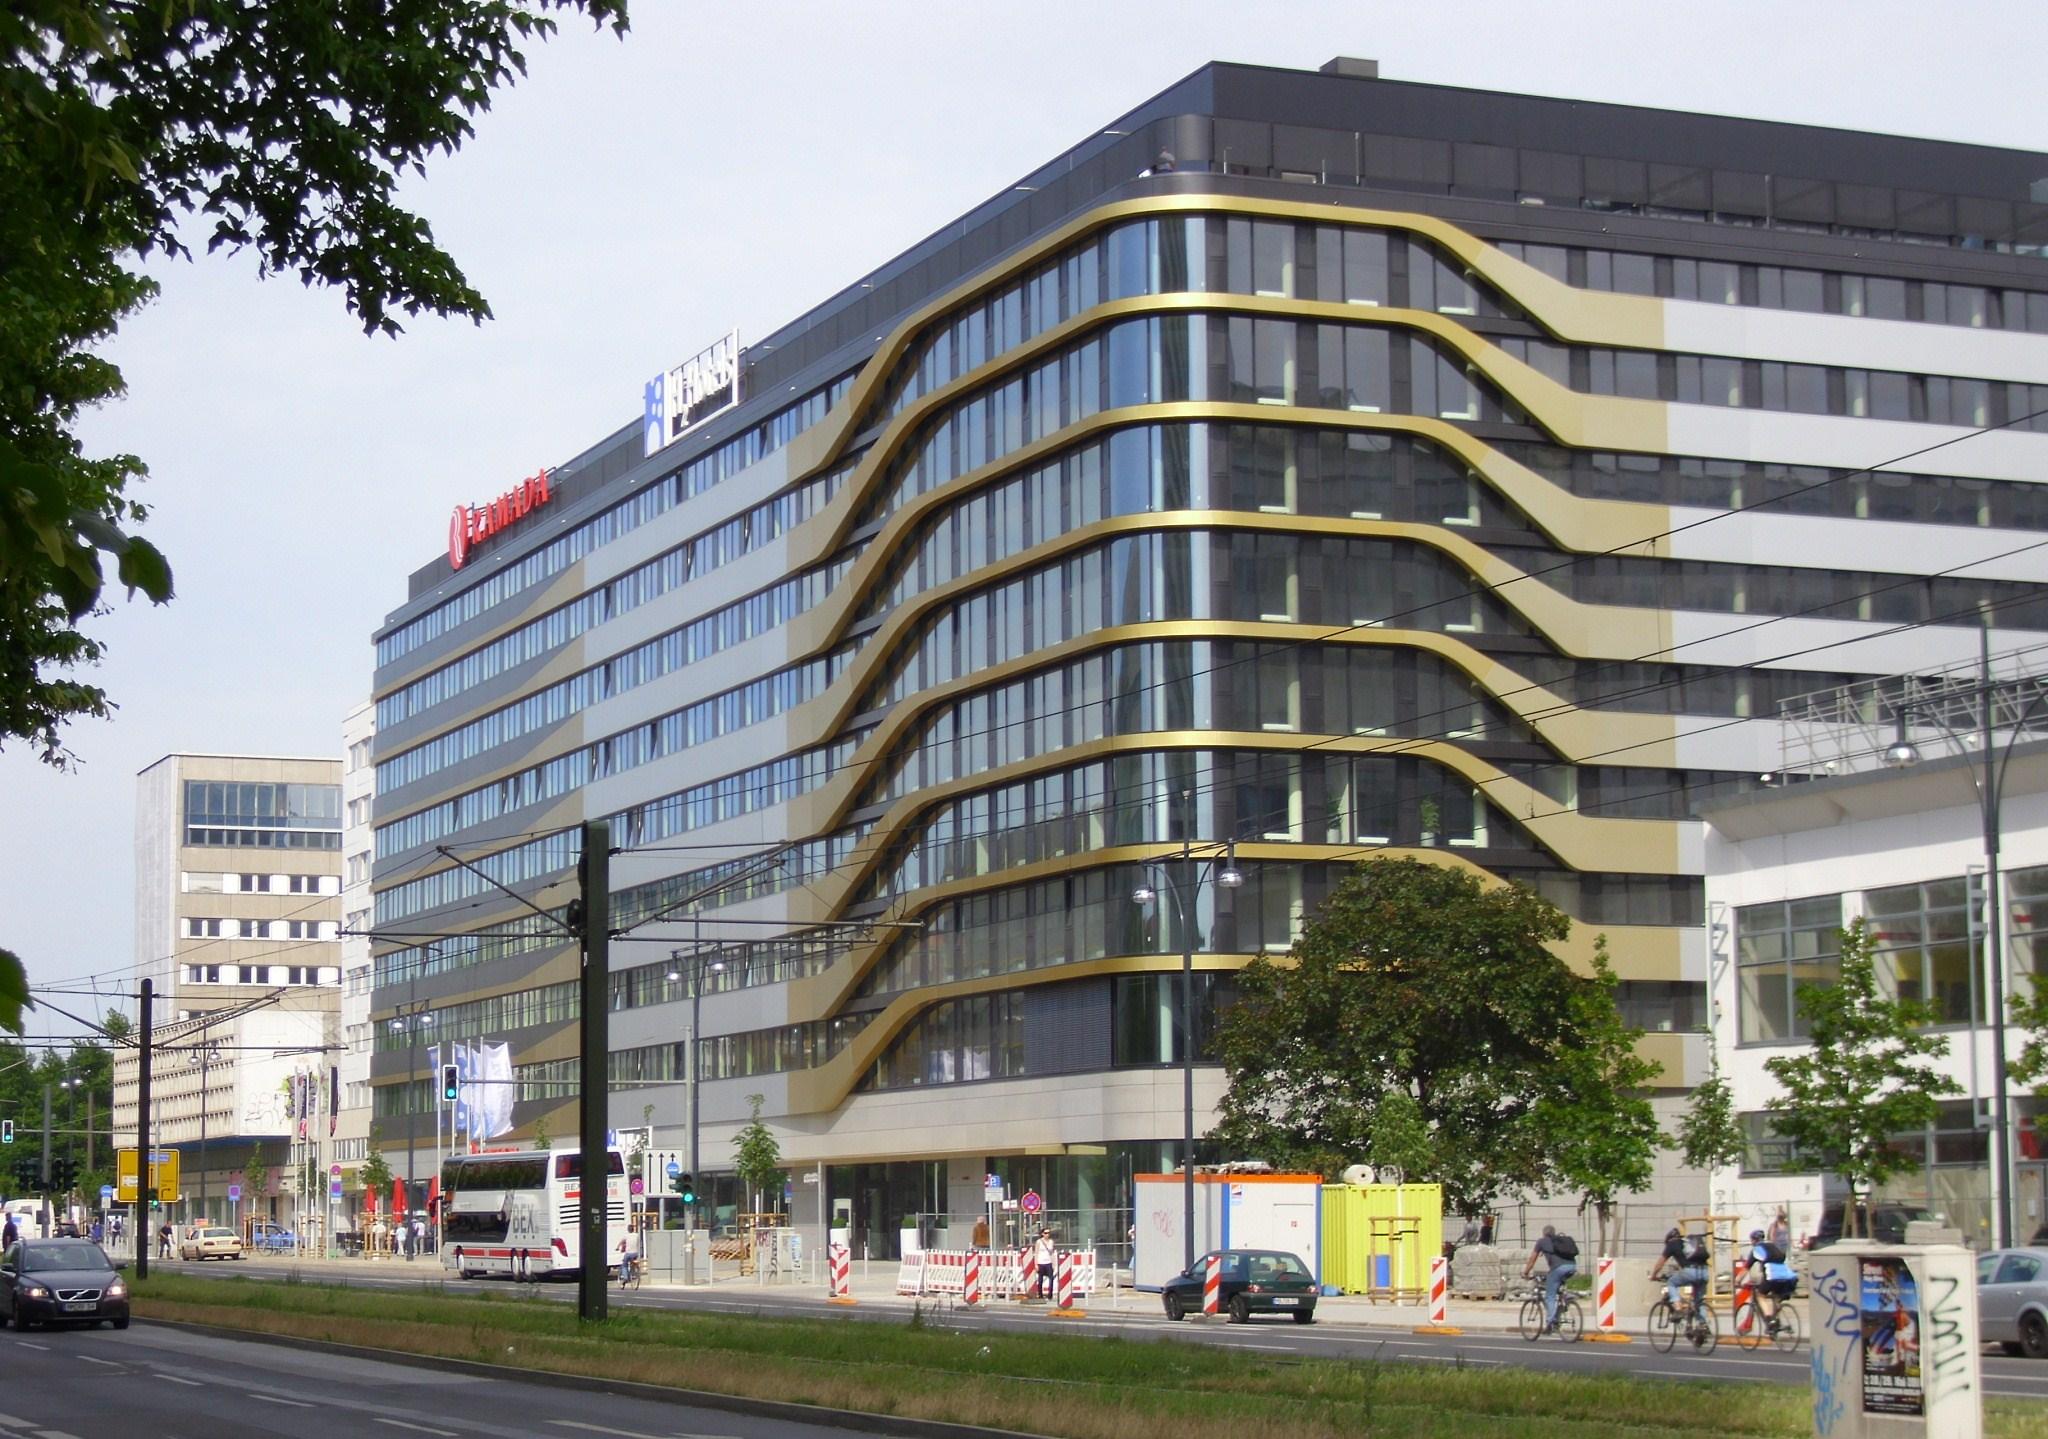 H Hotel Alexanderplatz Berlin Bewertung